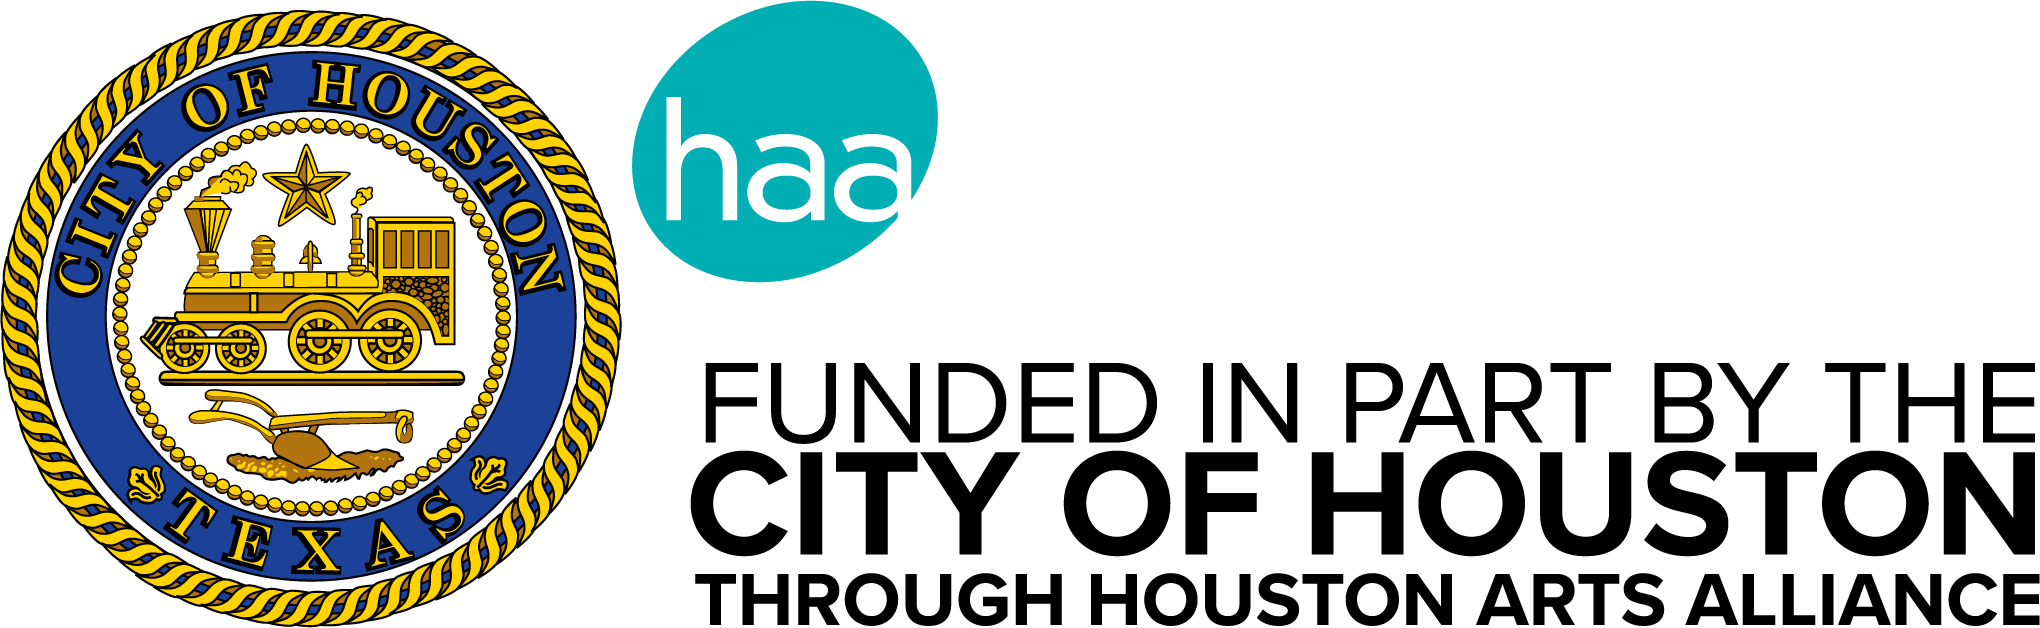 COH HAA Logo